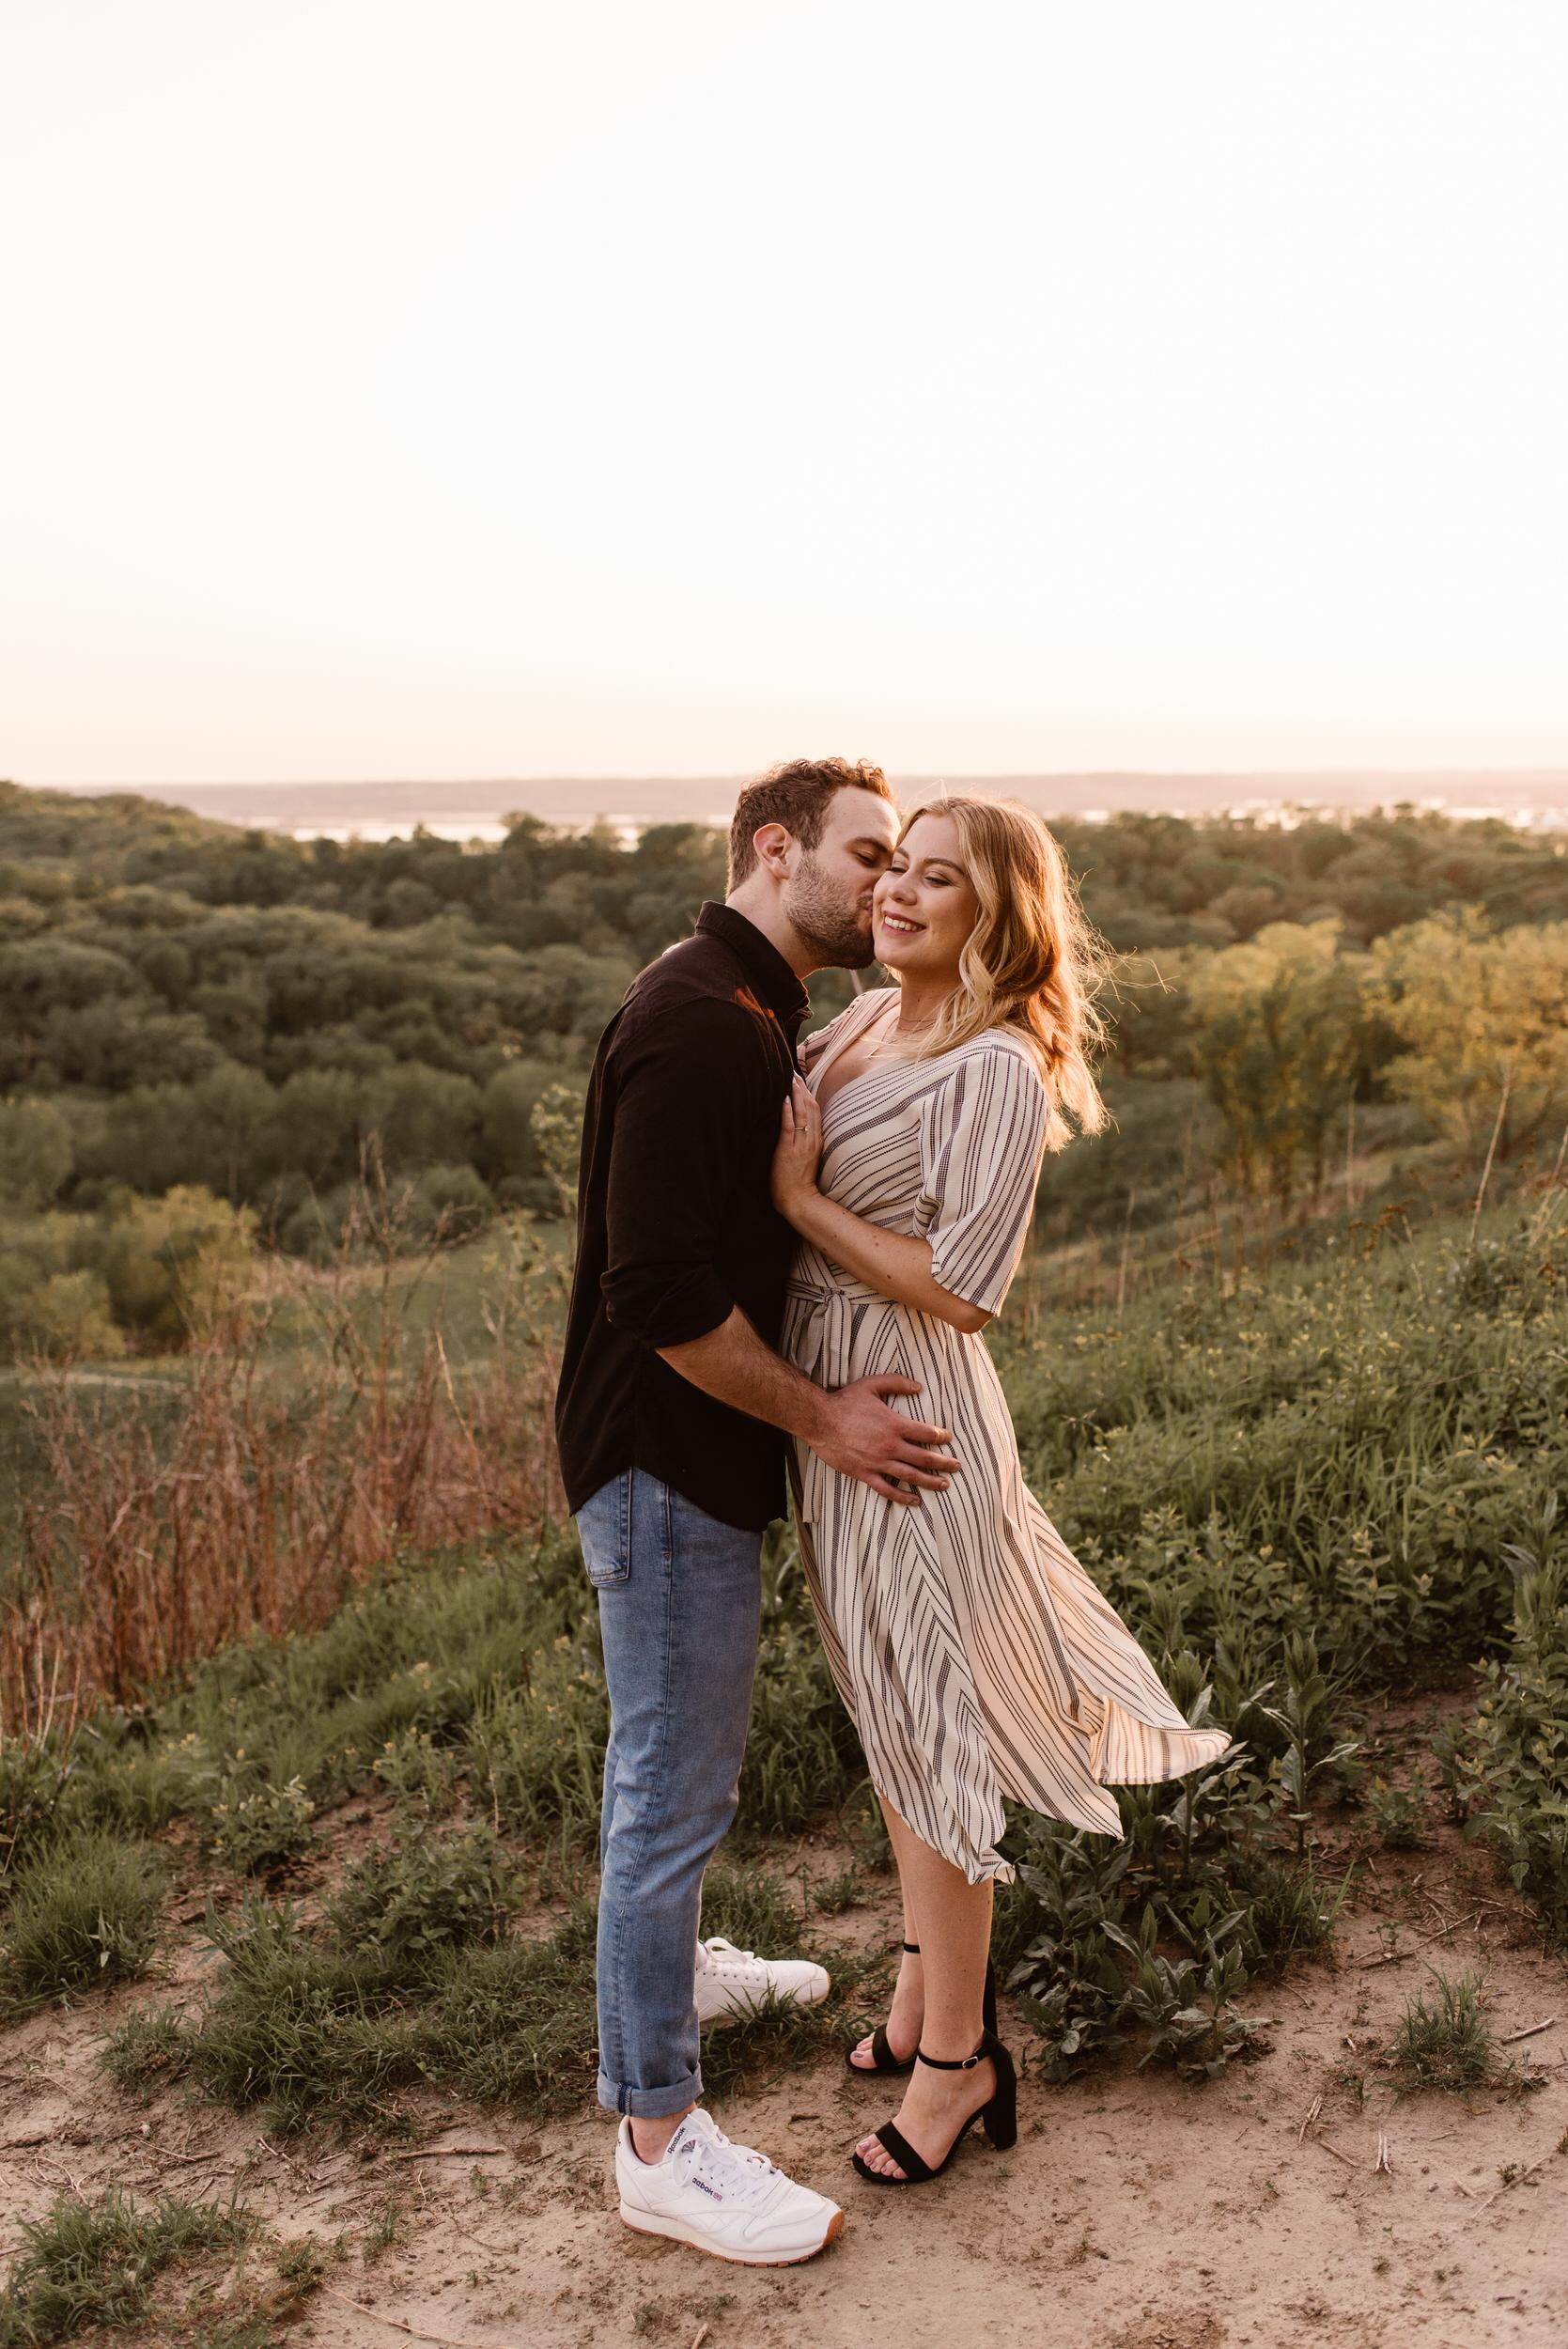 Omaha-Nebraska-Engagement-Session-Kaylie-Sirek-Photography-150.jpg